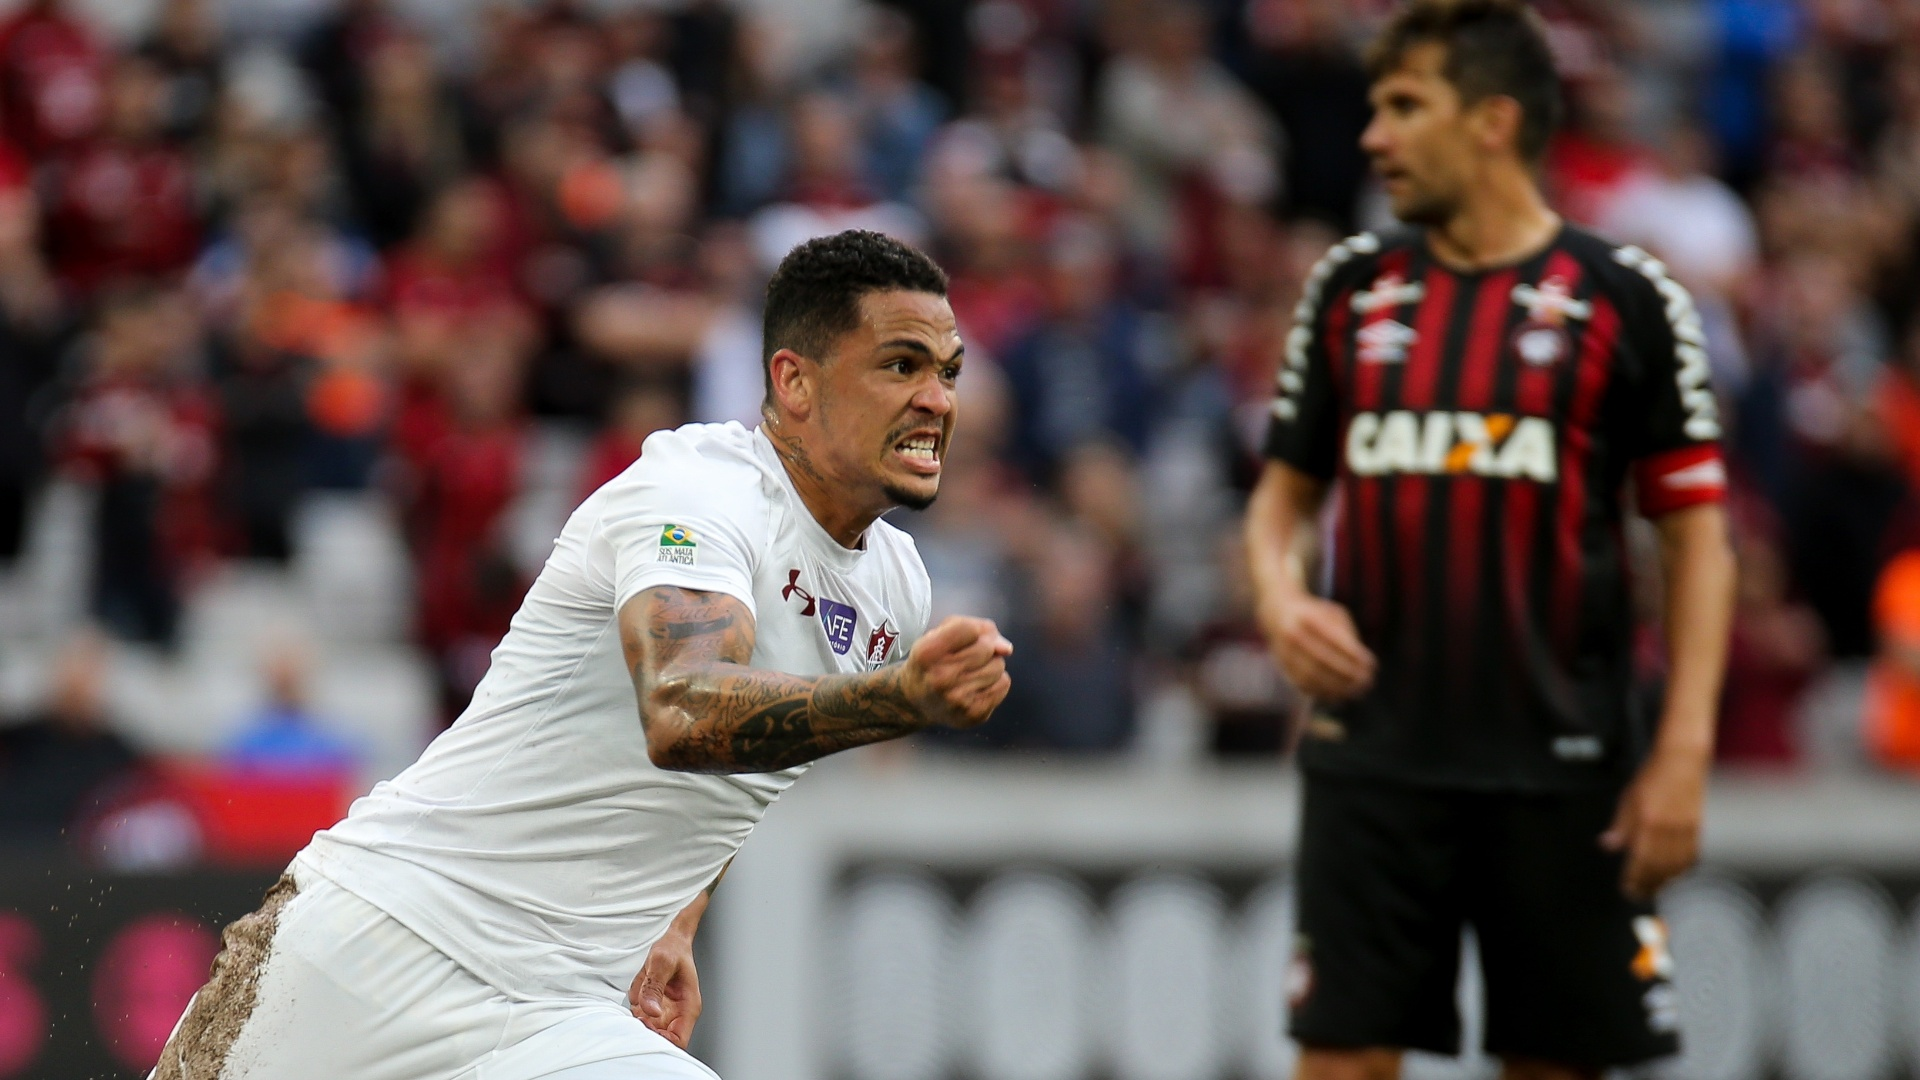 O atacante Luciano comemoram gol do Fluminense diante do Atlético-PR